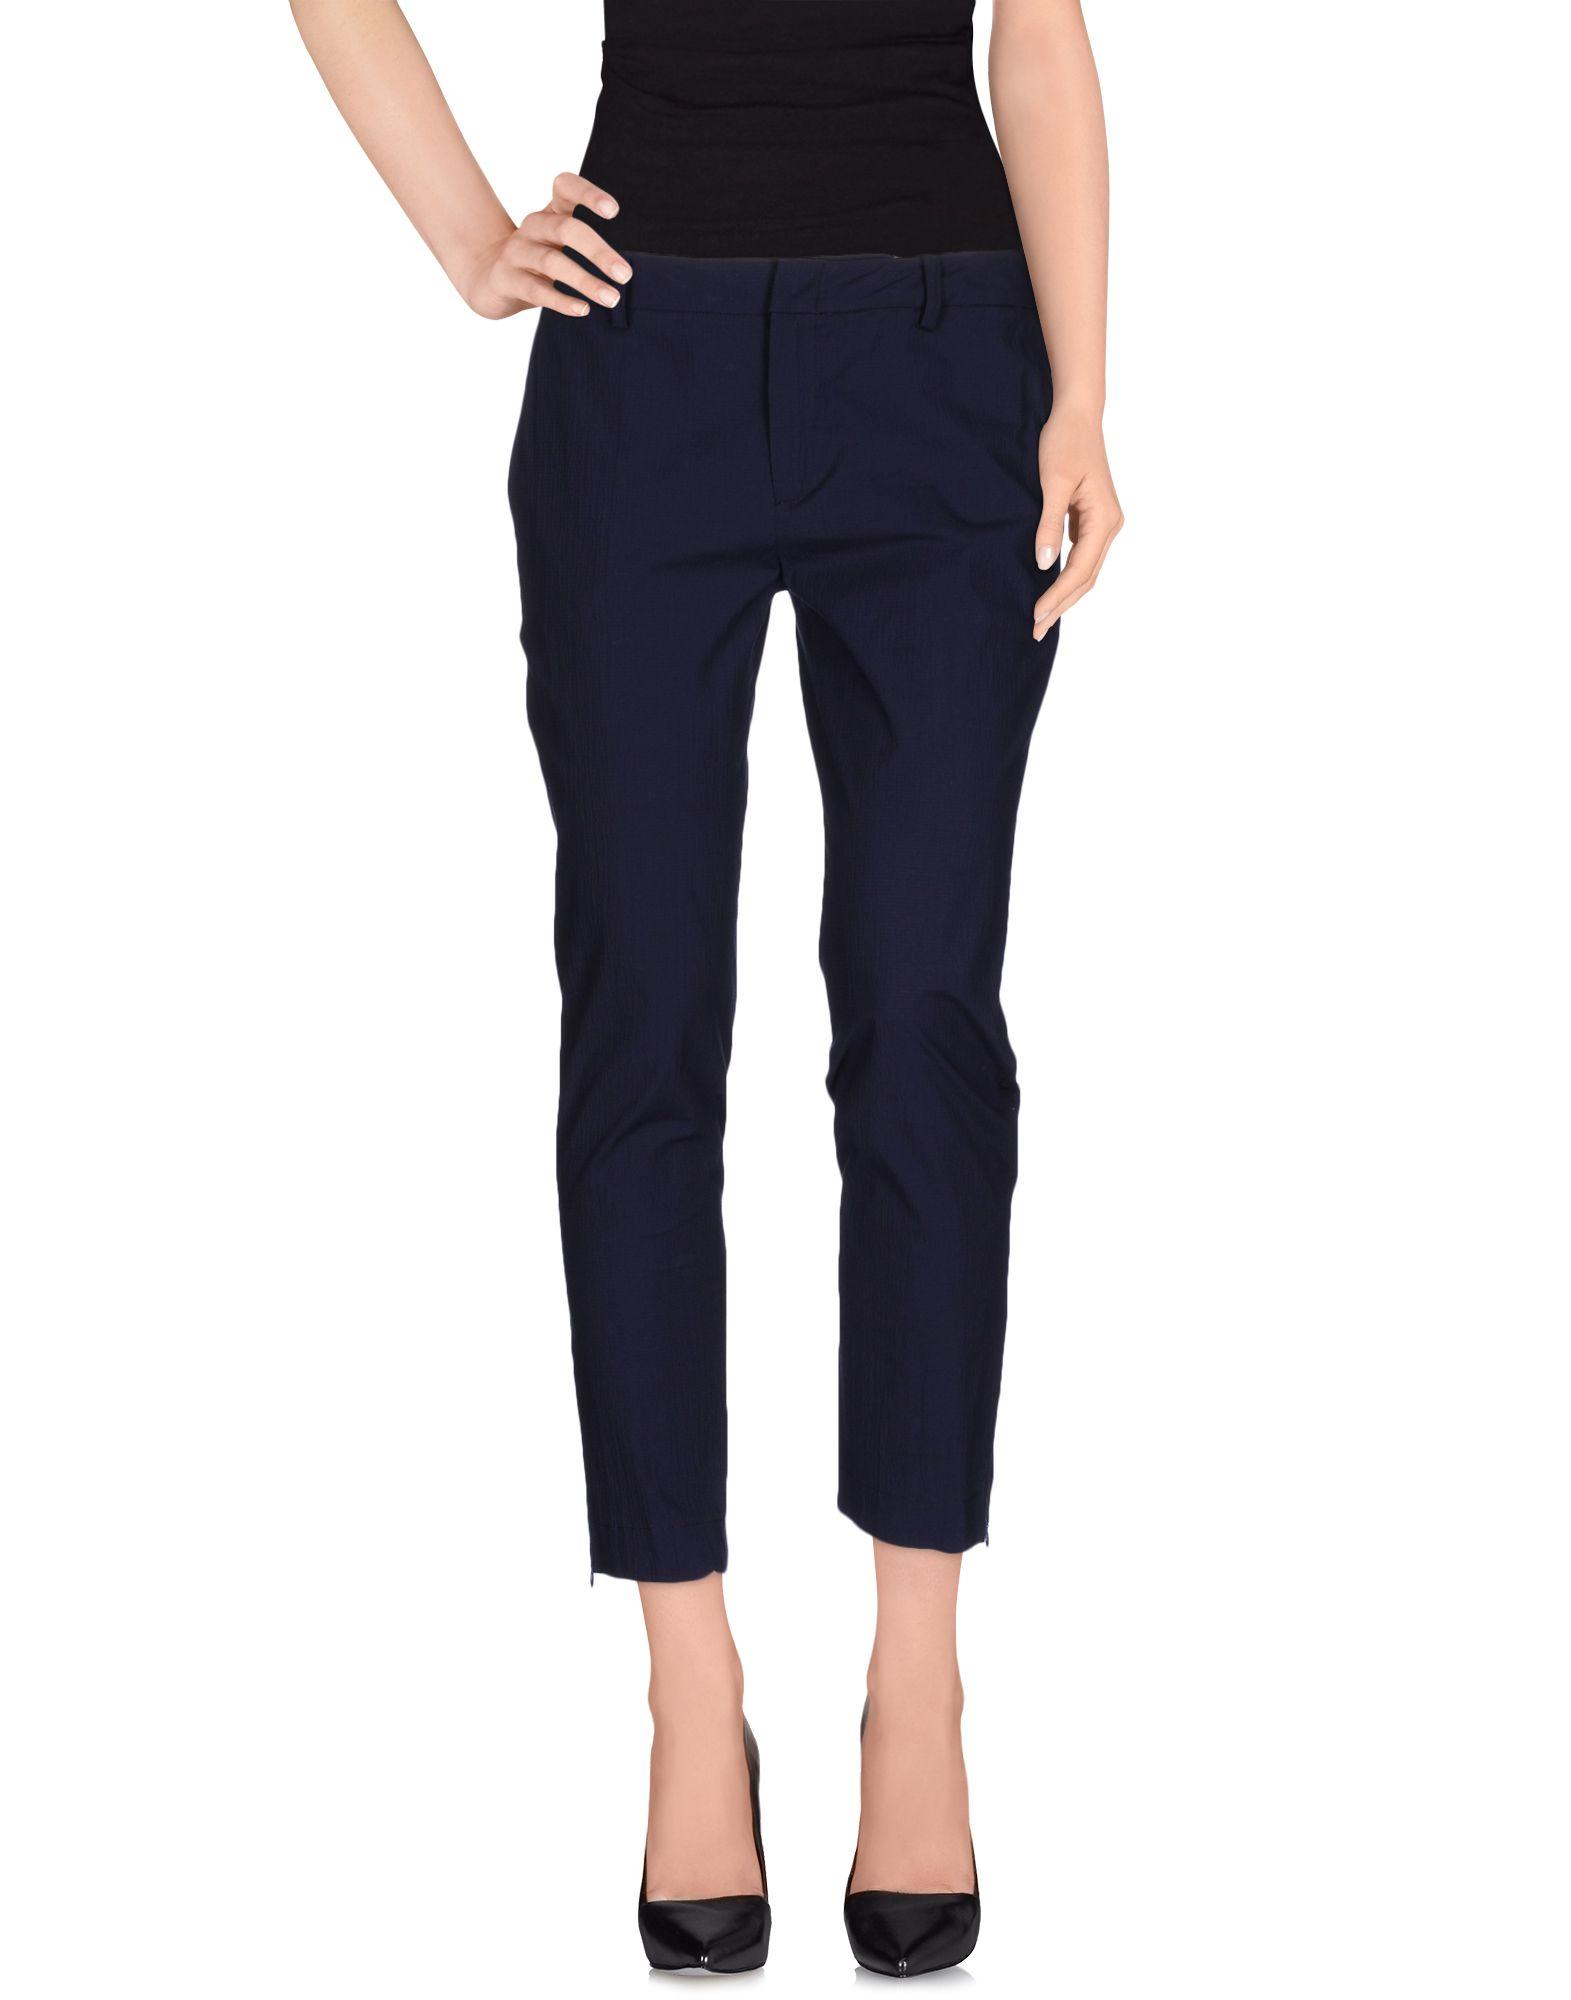 Pantalone L' Autre Chose Donna - Acquista online su xEIr0